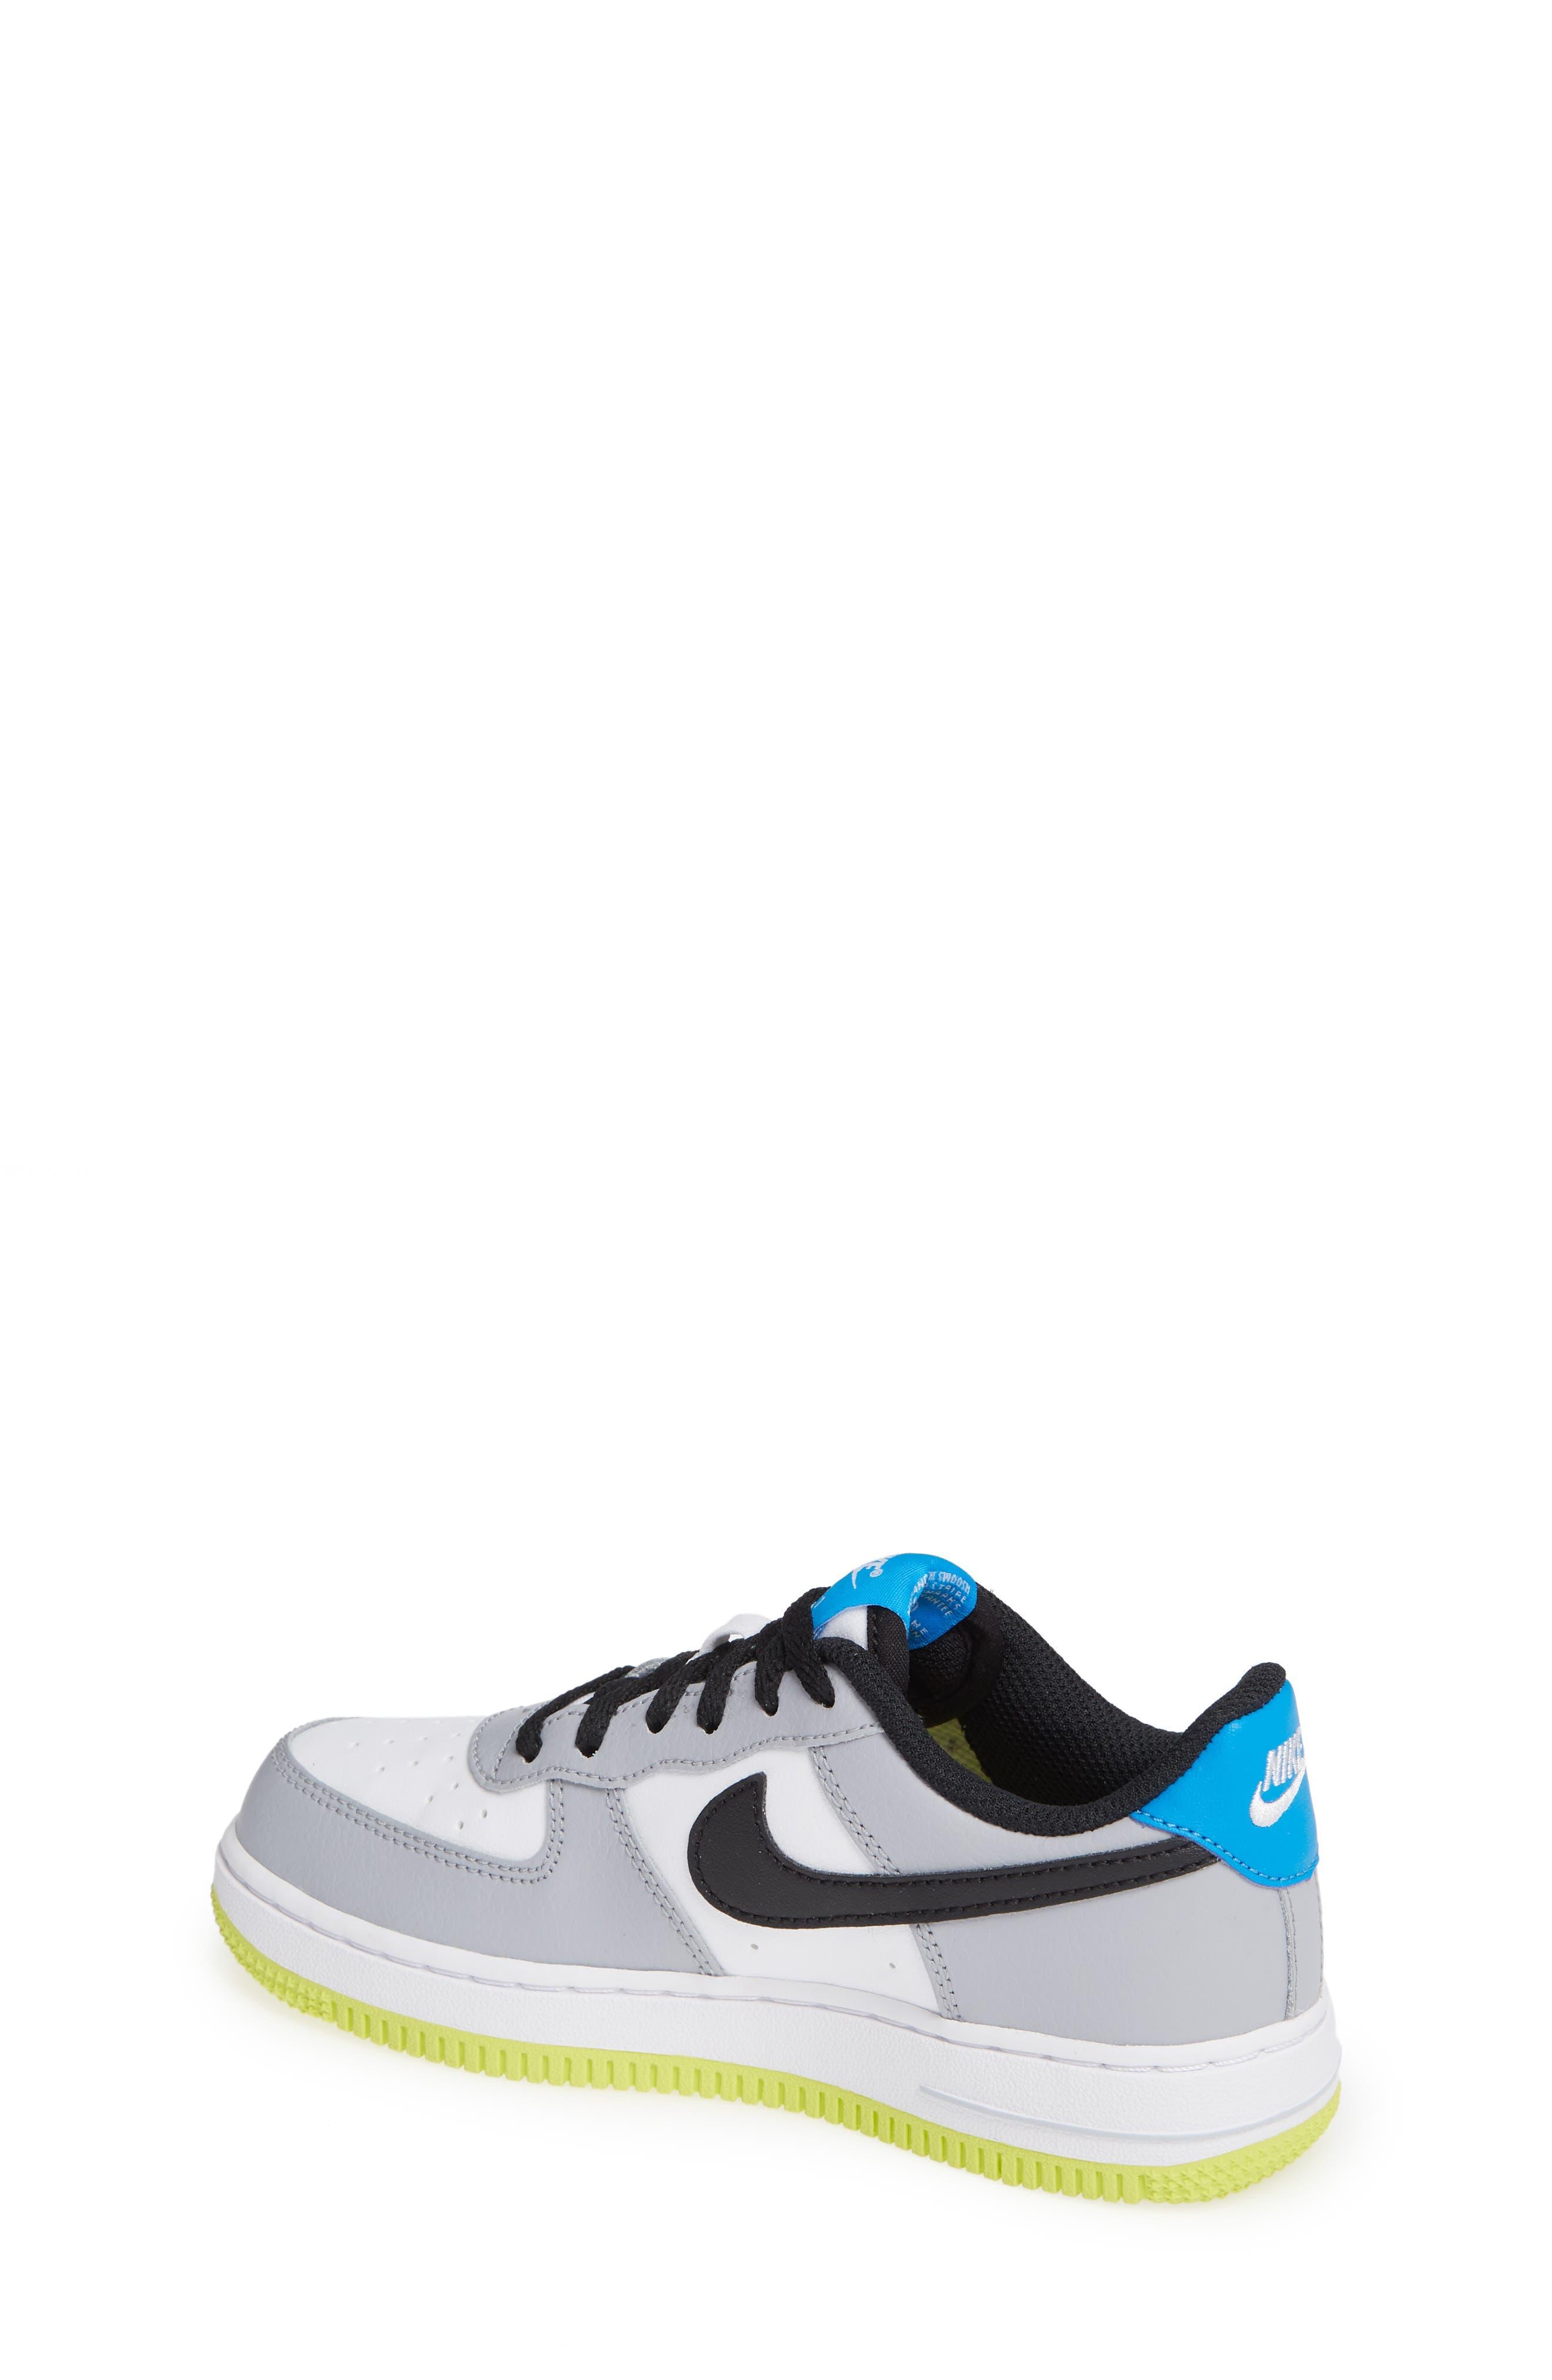 Air Force 1 Sneaker,                             Alternate thumbnail 2, color,                             Wolf Grey/ Black/ White/ Blue